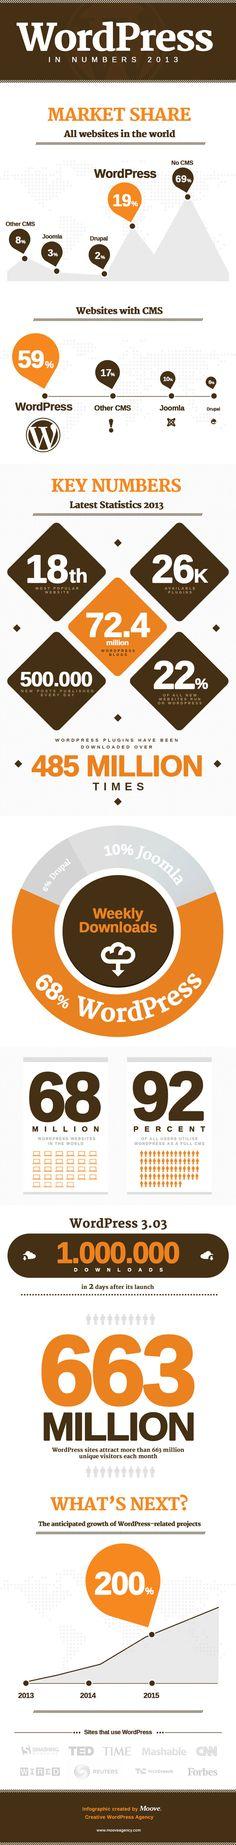 WordPress CMS in Numbers 2013 an infographic WordPress